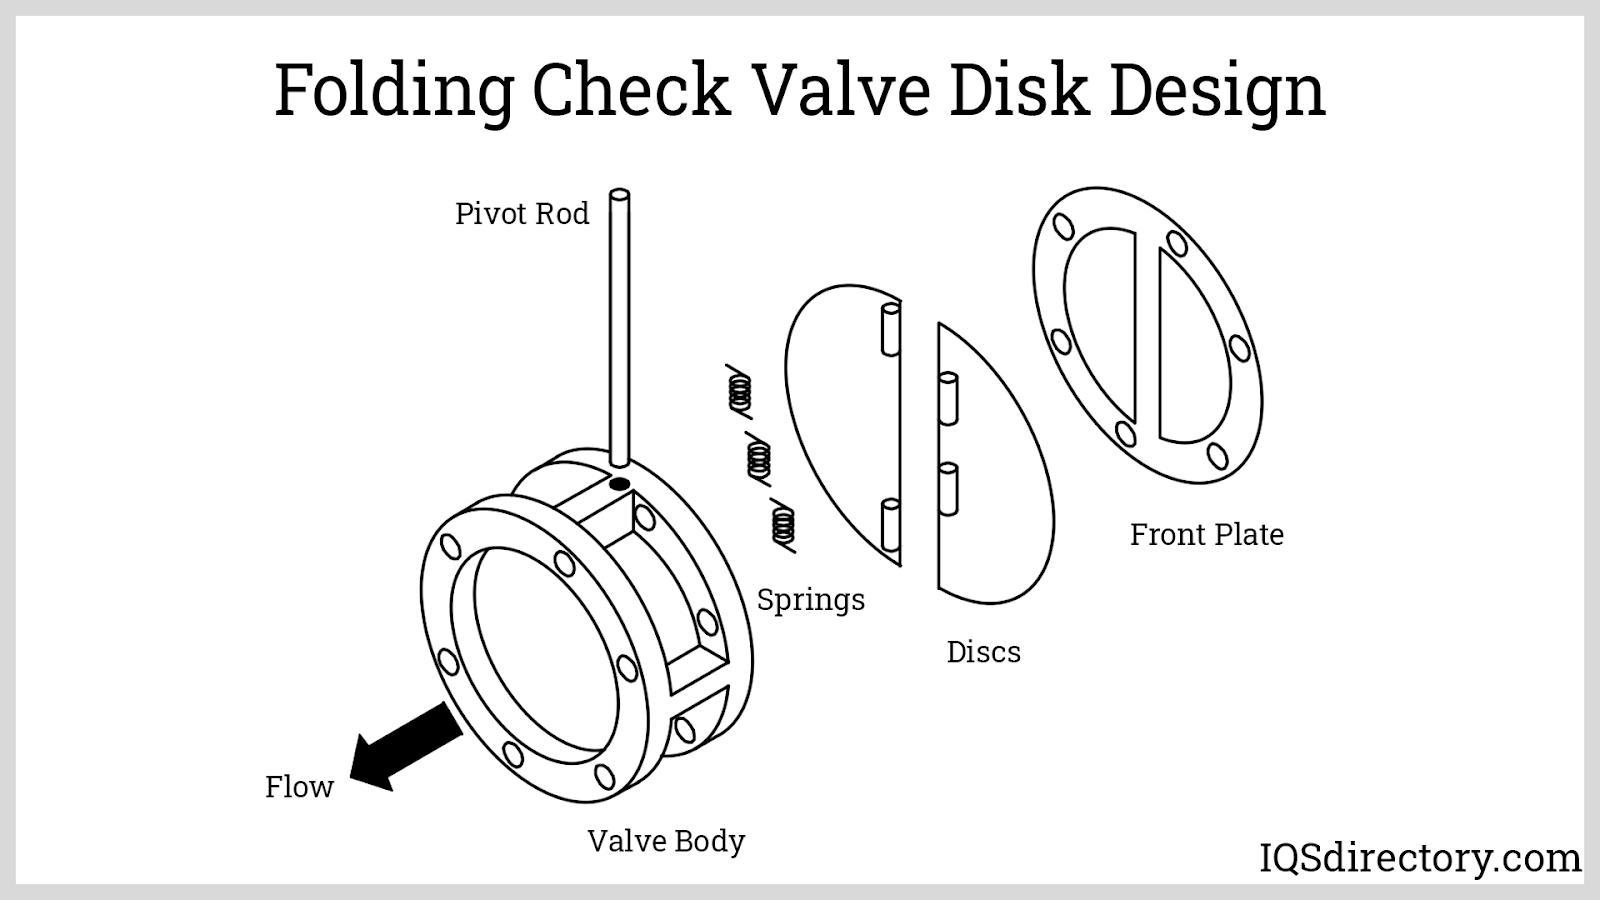 Folding Check Valve Disk Design